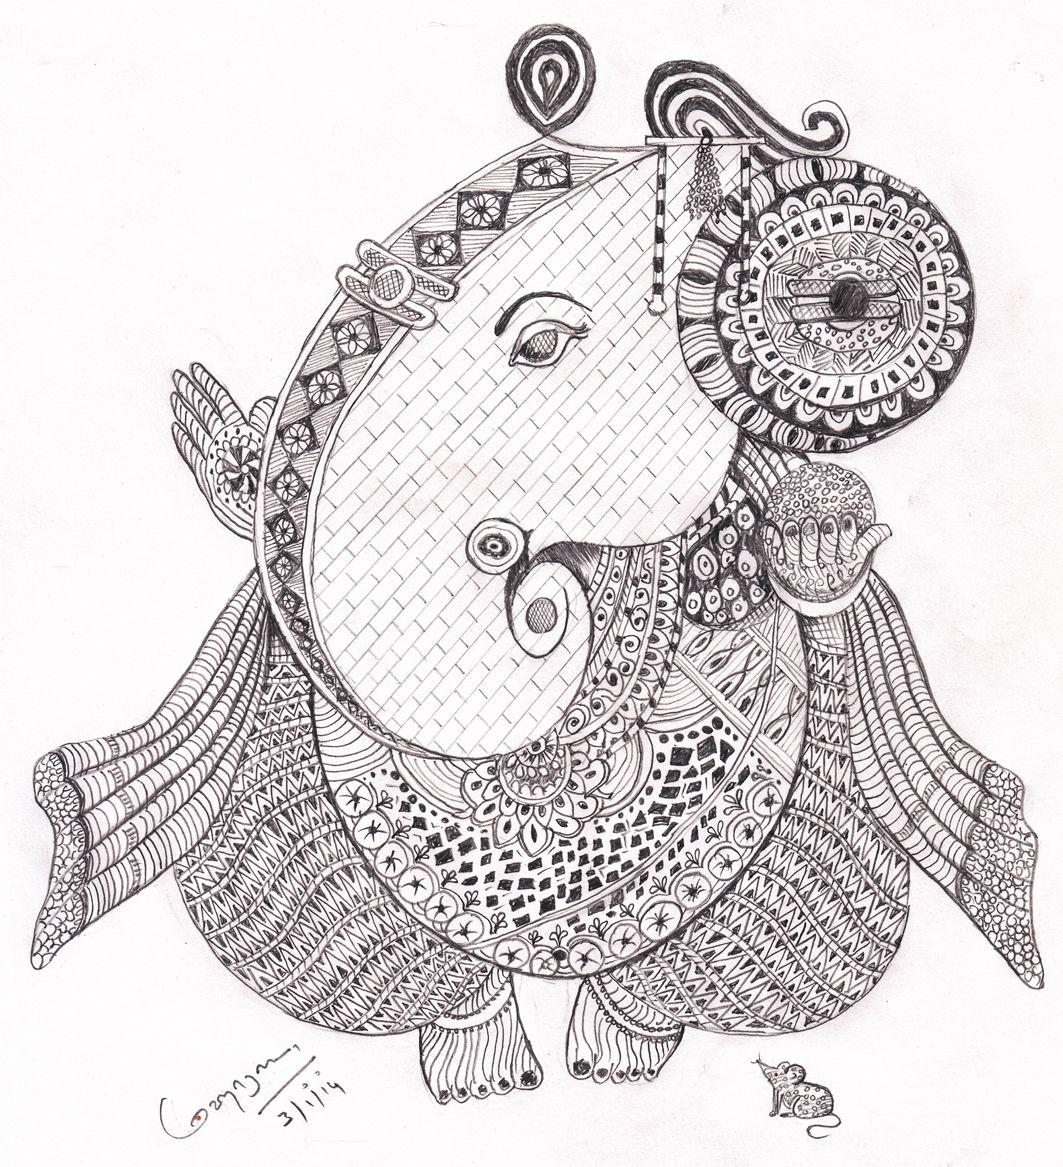 Black pen sketch in 2019 art sketches pencil drawings